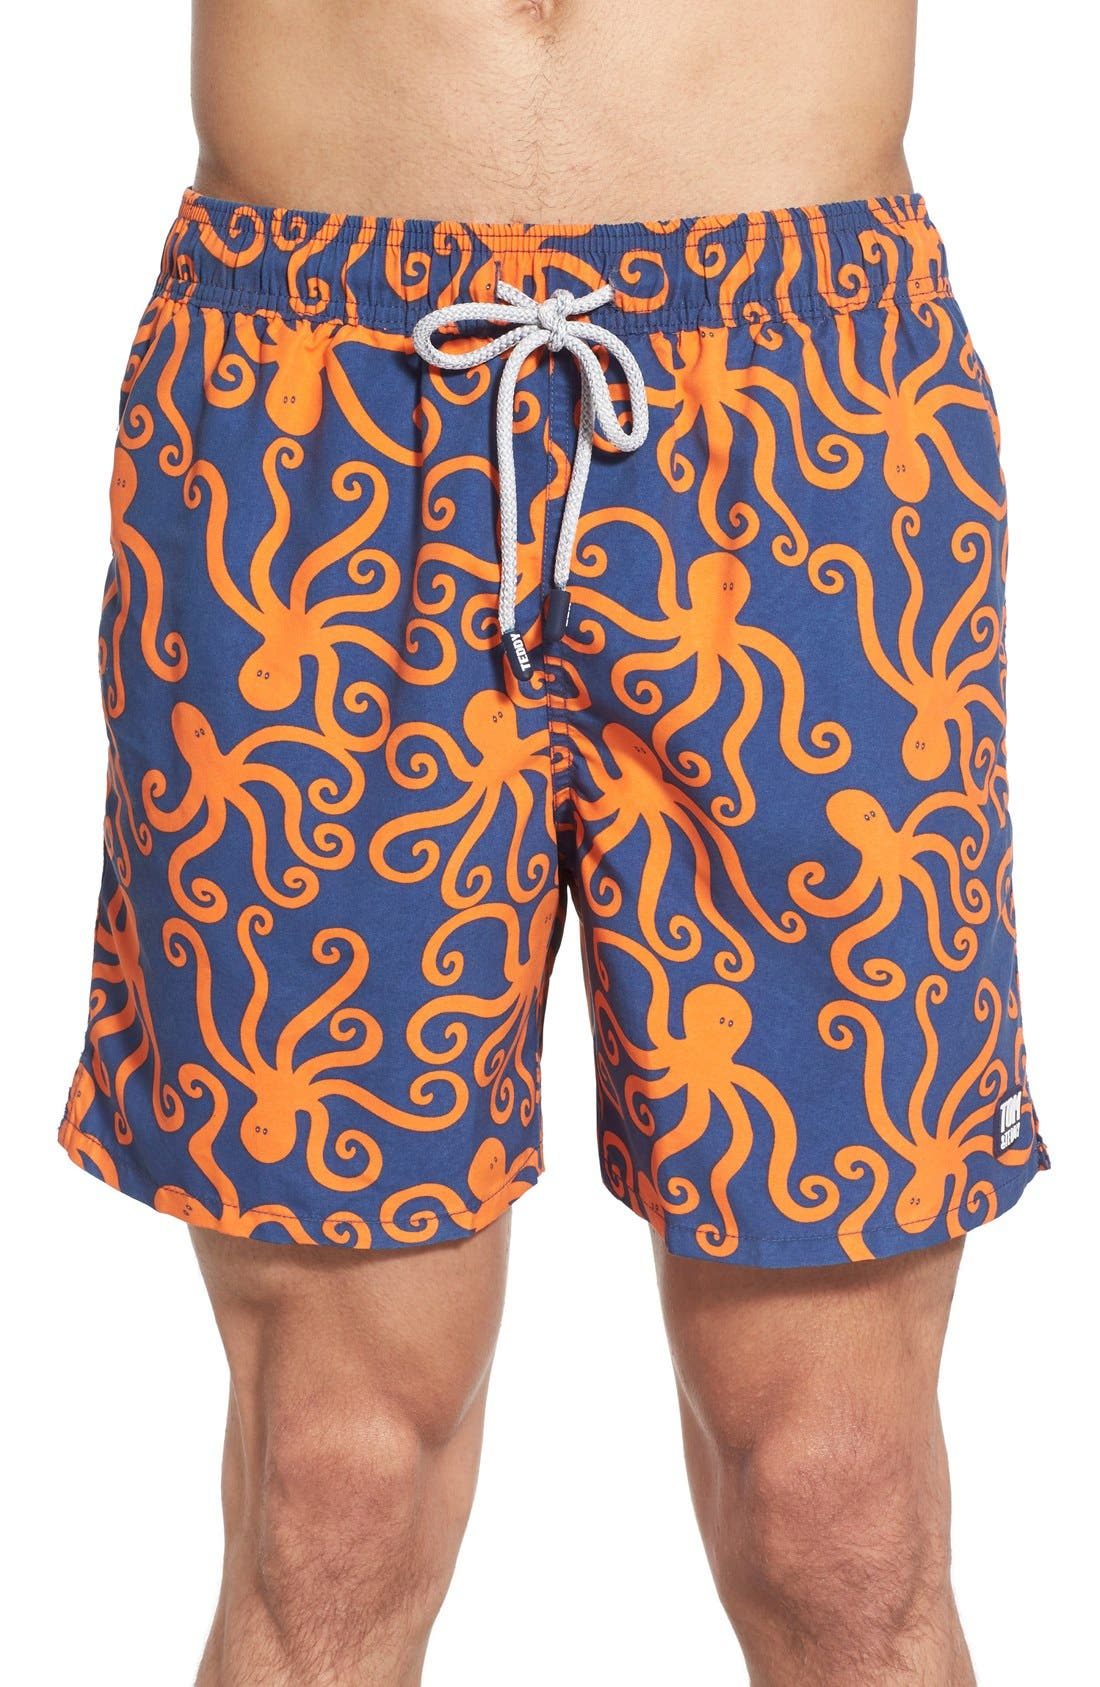 Main Image - Tom & Teddy 'Octopus Pattern' Swim Trunks